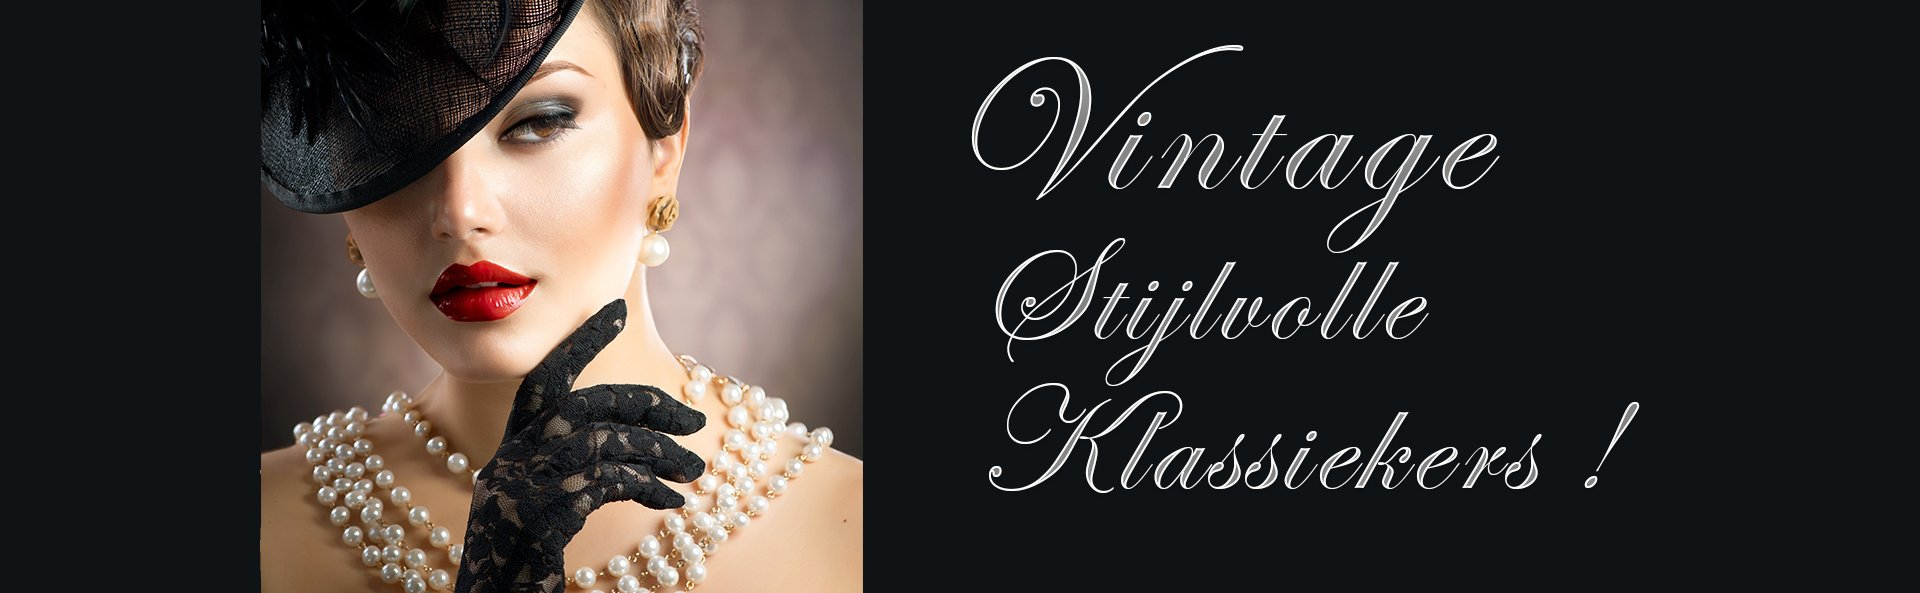 Vintage sieraden